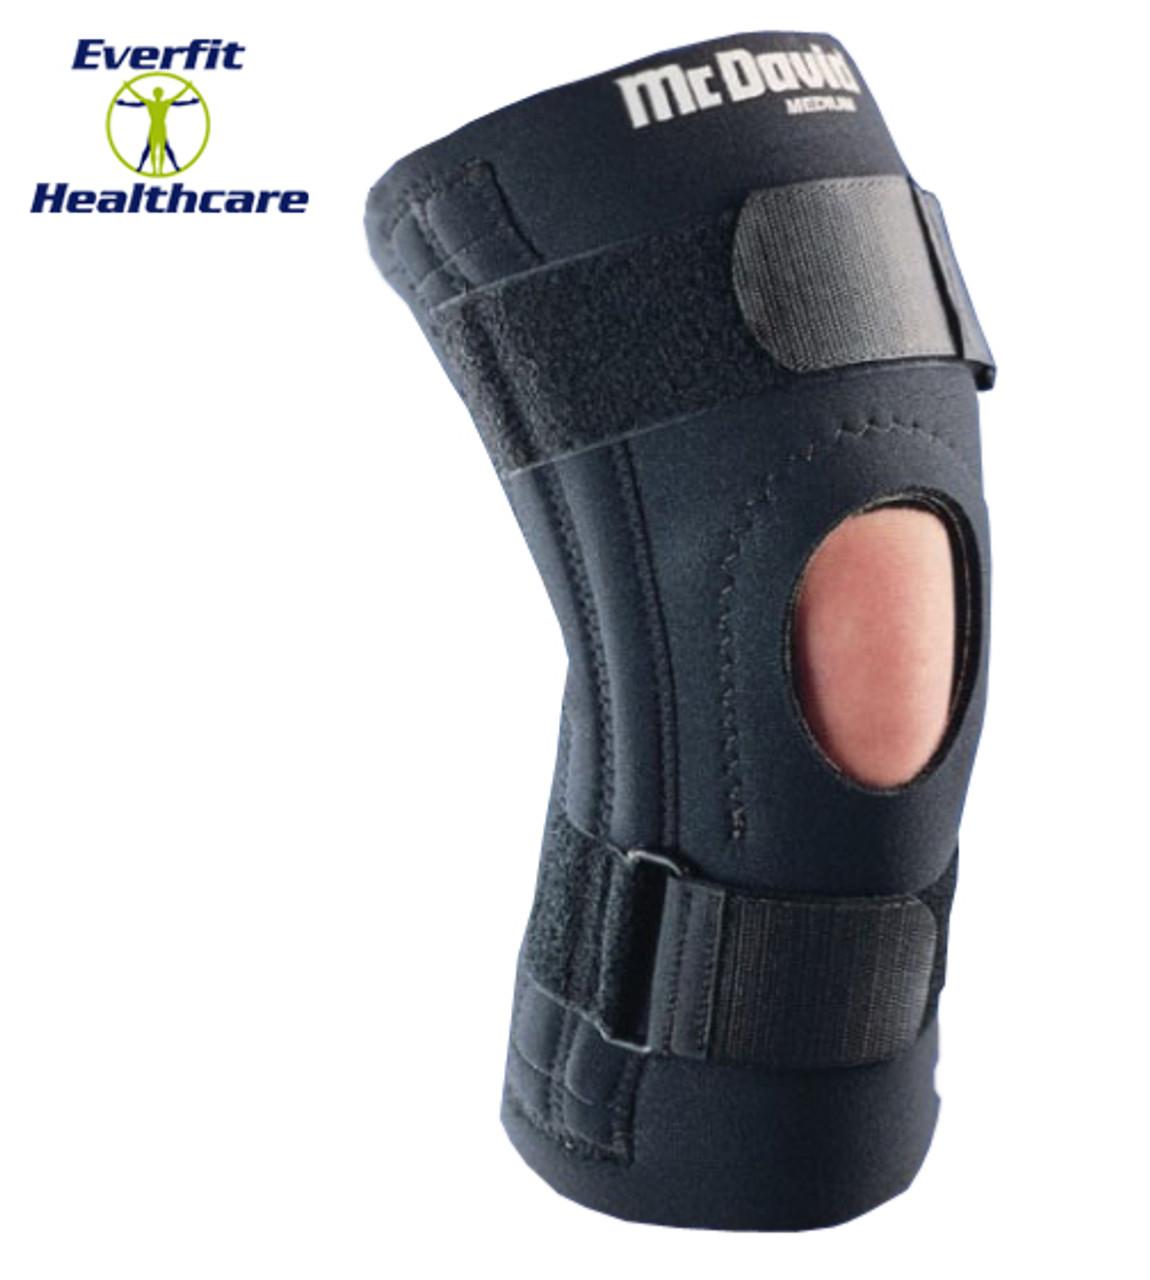 fa104a442b McDavid Thermal Patella Knee Support - EverfitHealthcare.com.au